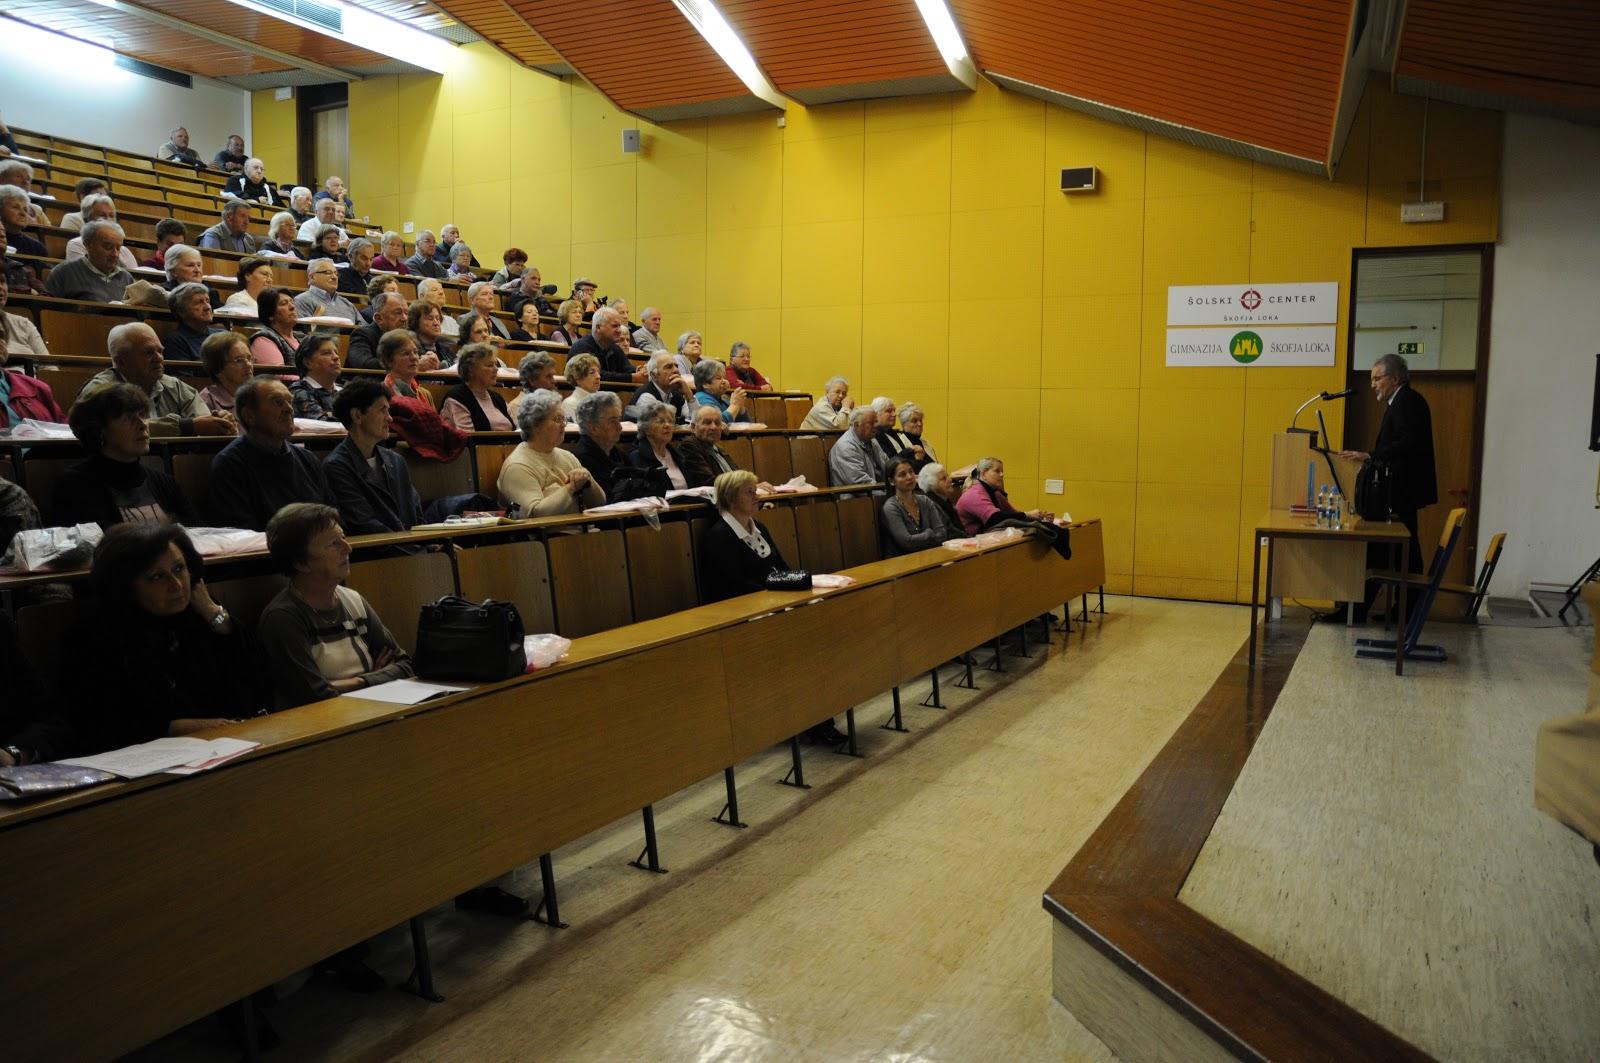 Predavanje, dr. Camlek - oktober 2011 - DSC_3873.JPG